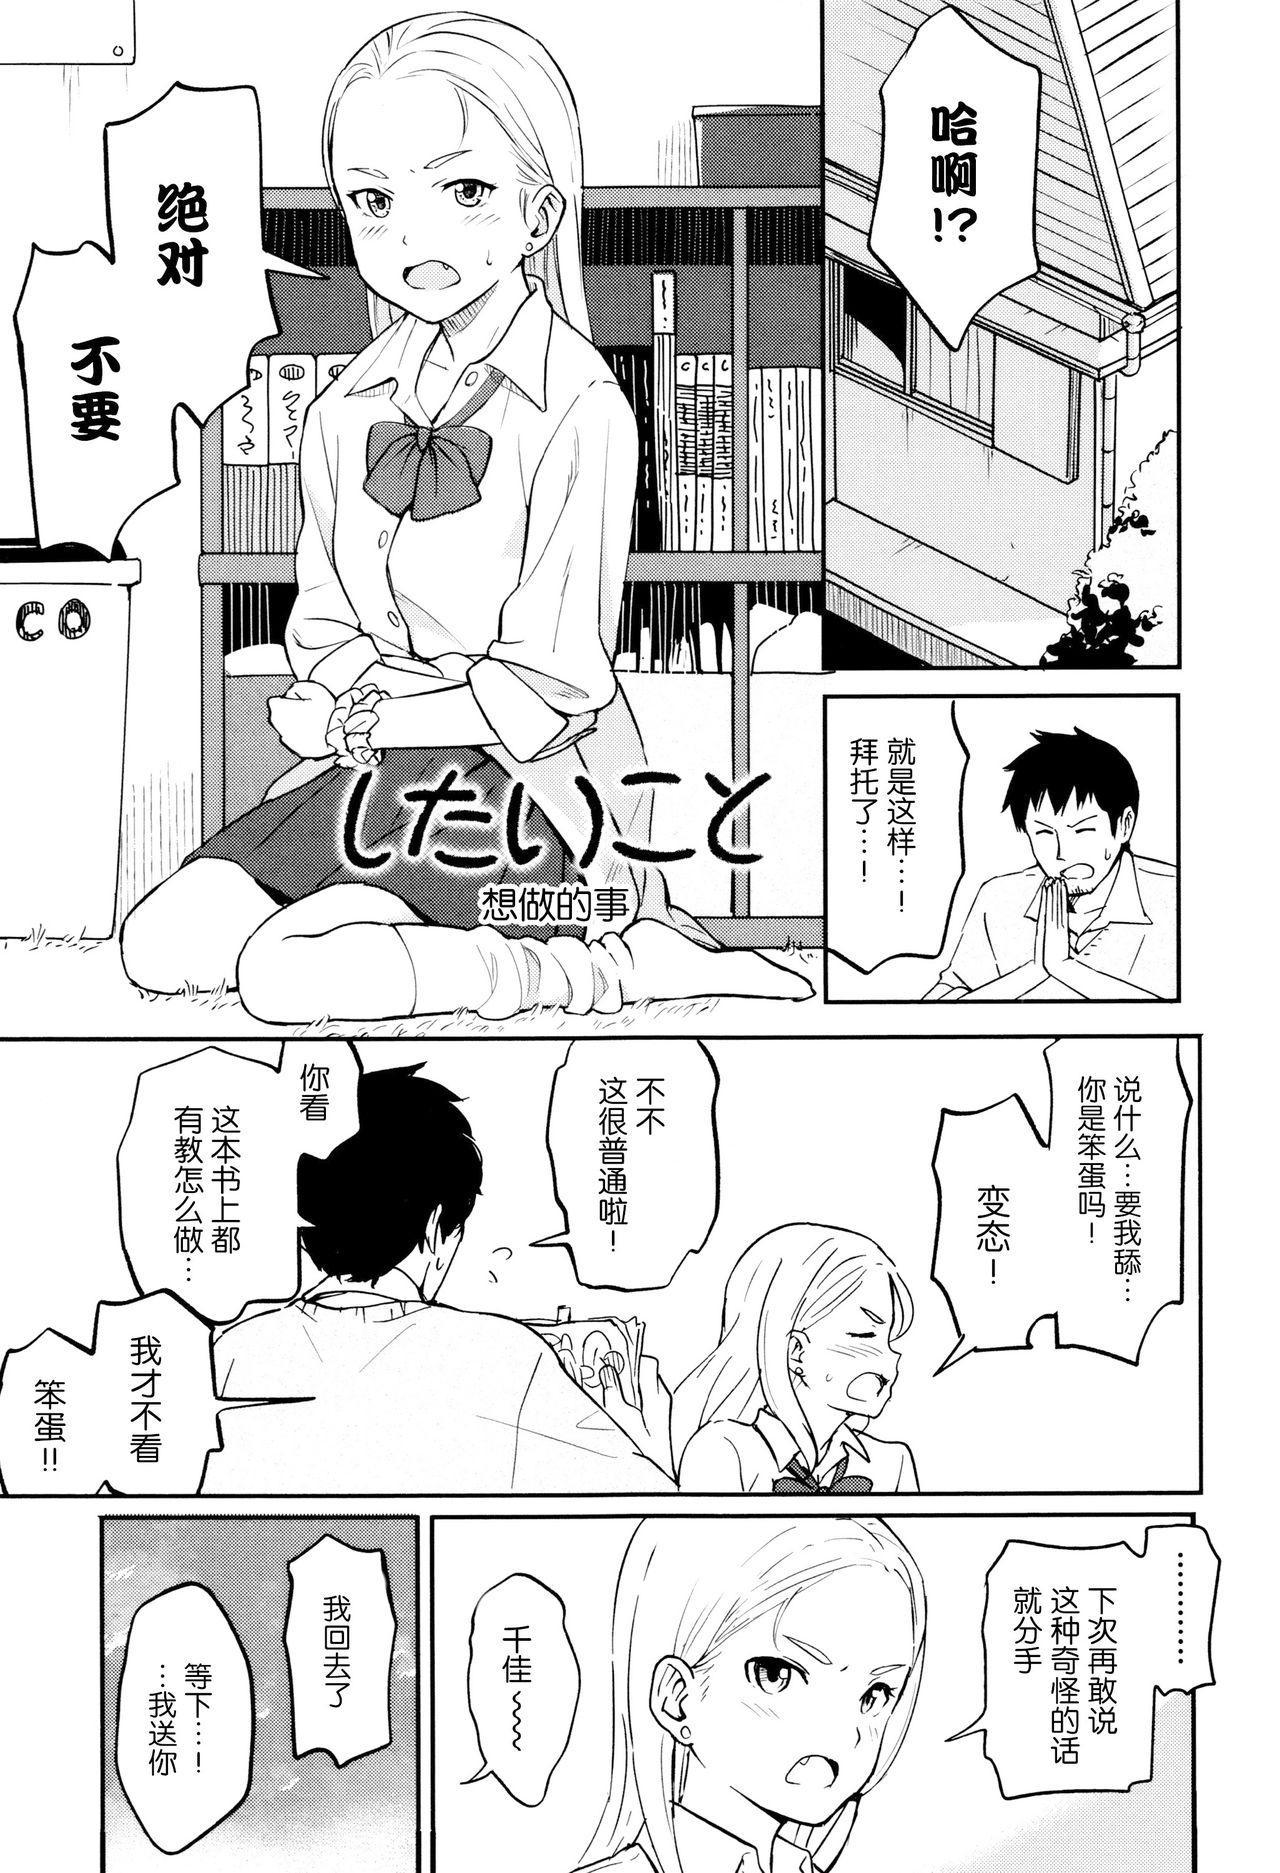 Tokubetsu na Mainichi - Special daily 71